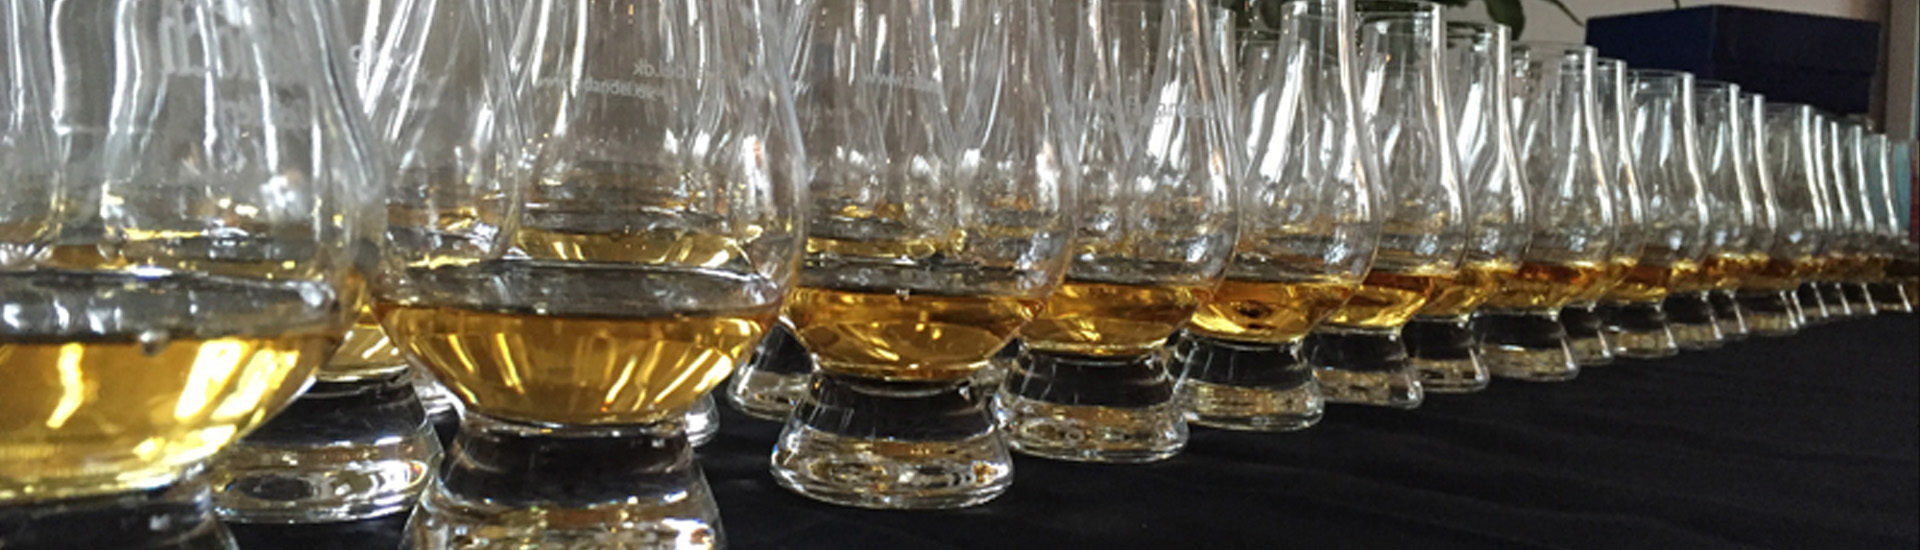 Whisky smagning hos Fadandel.dk